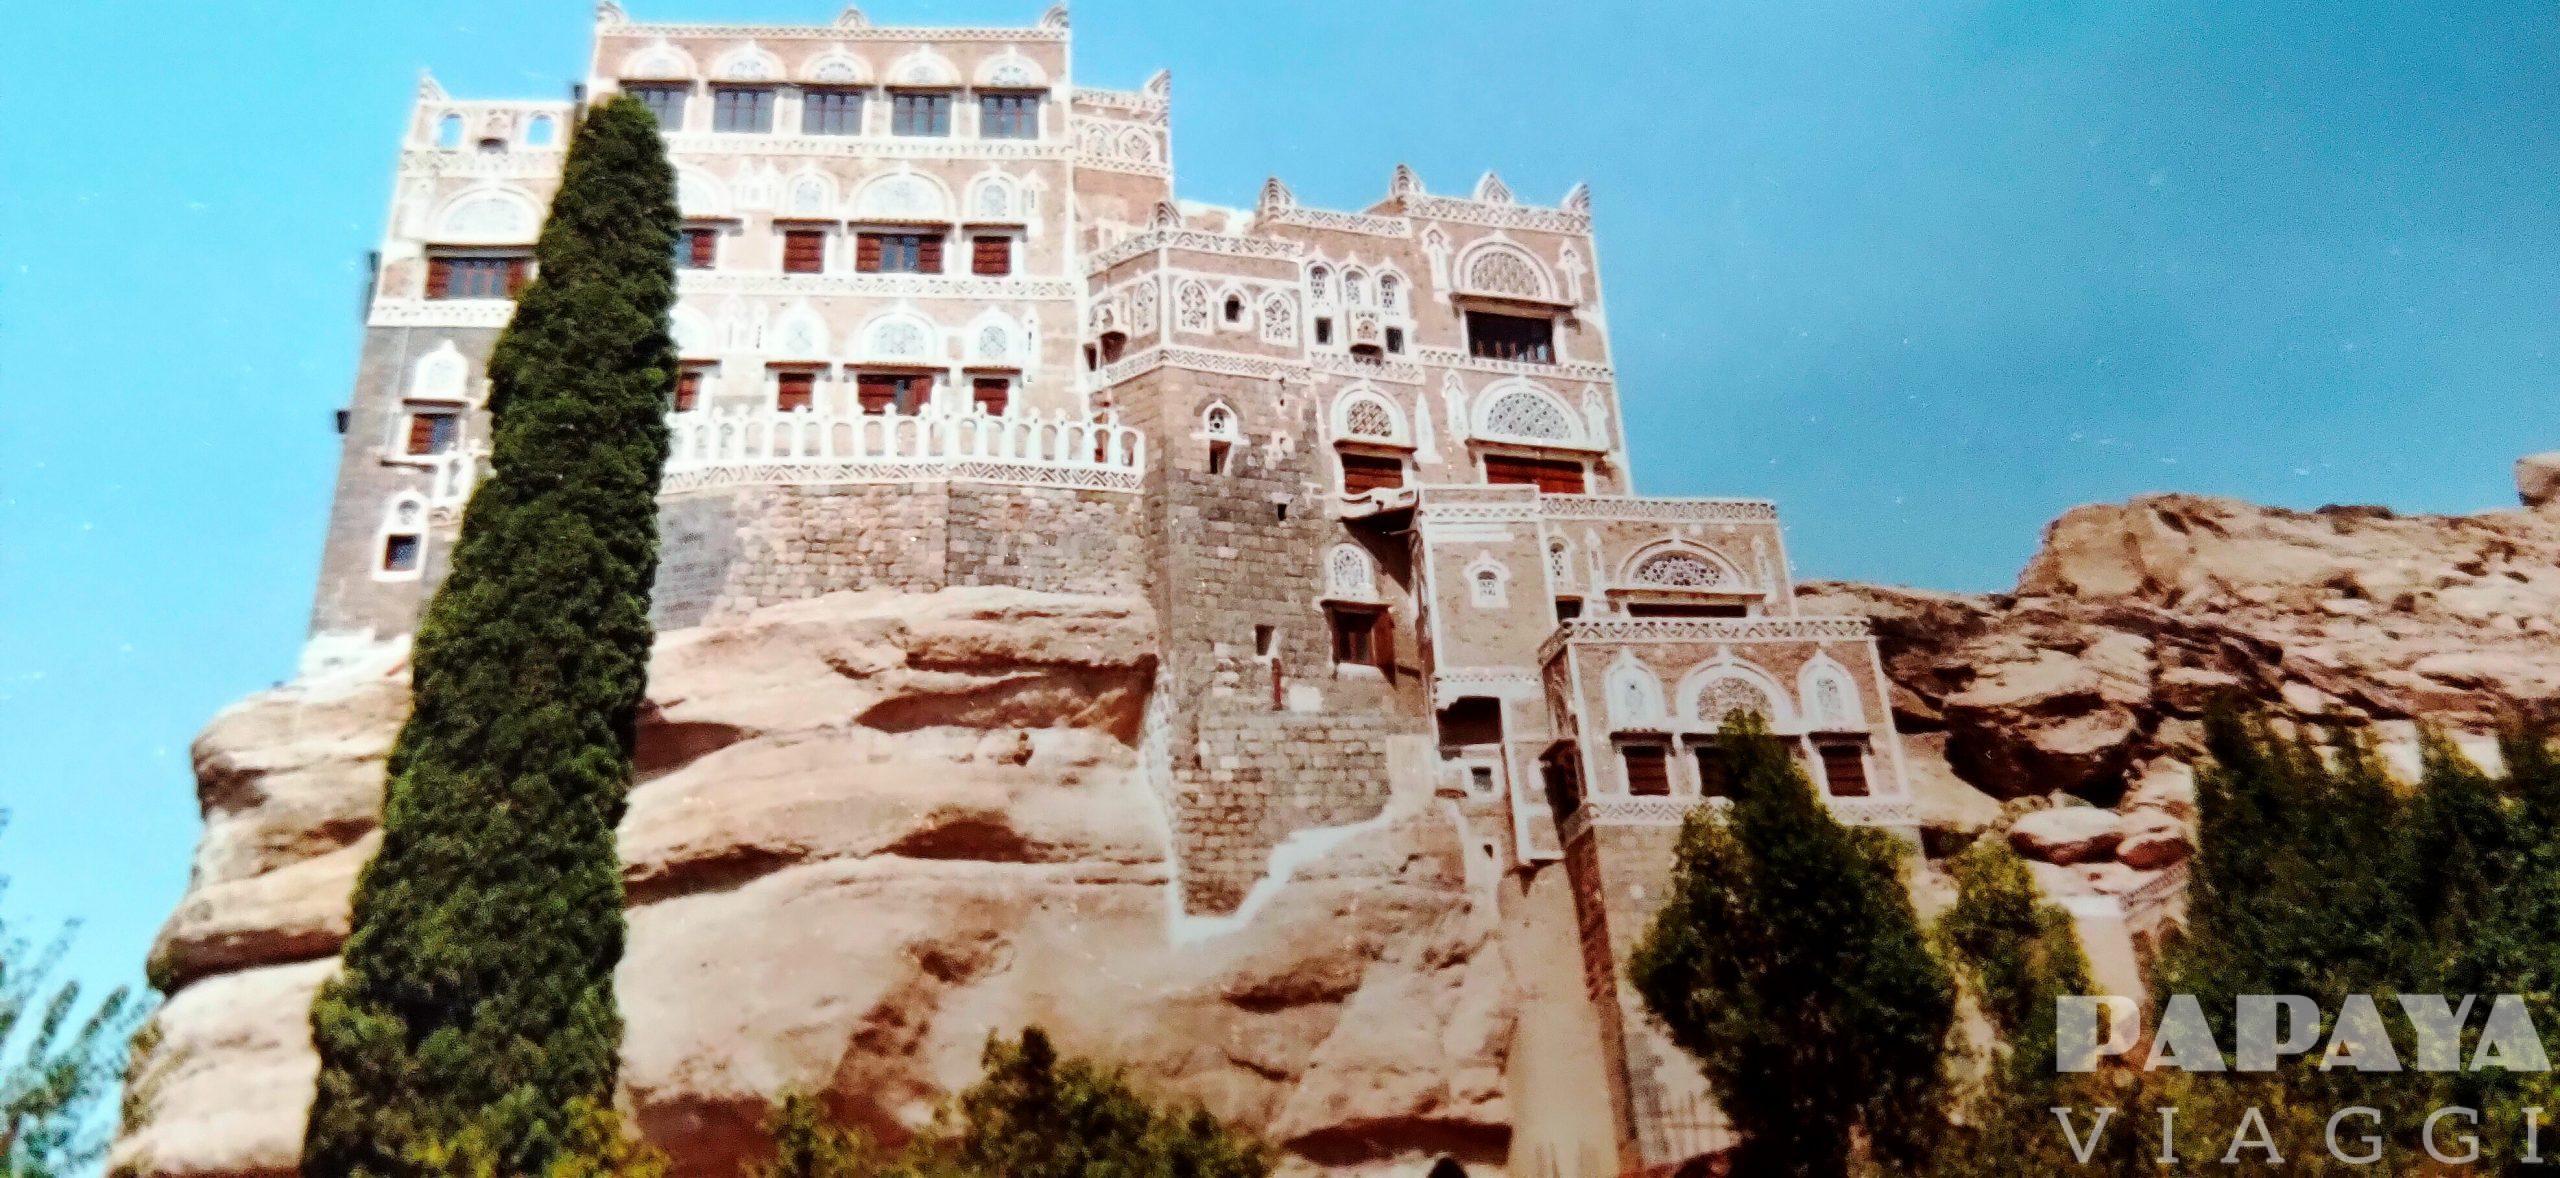 Gran tour dello Yemen